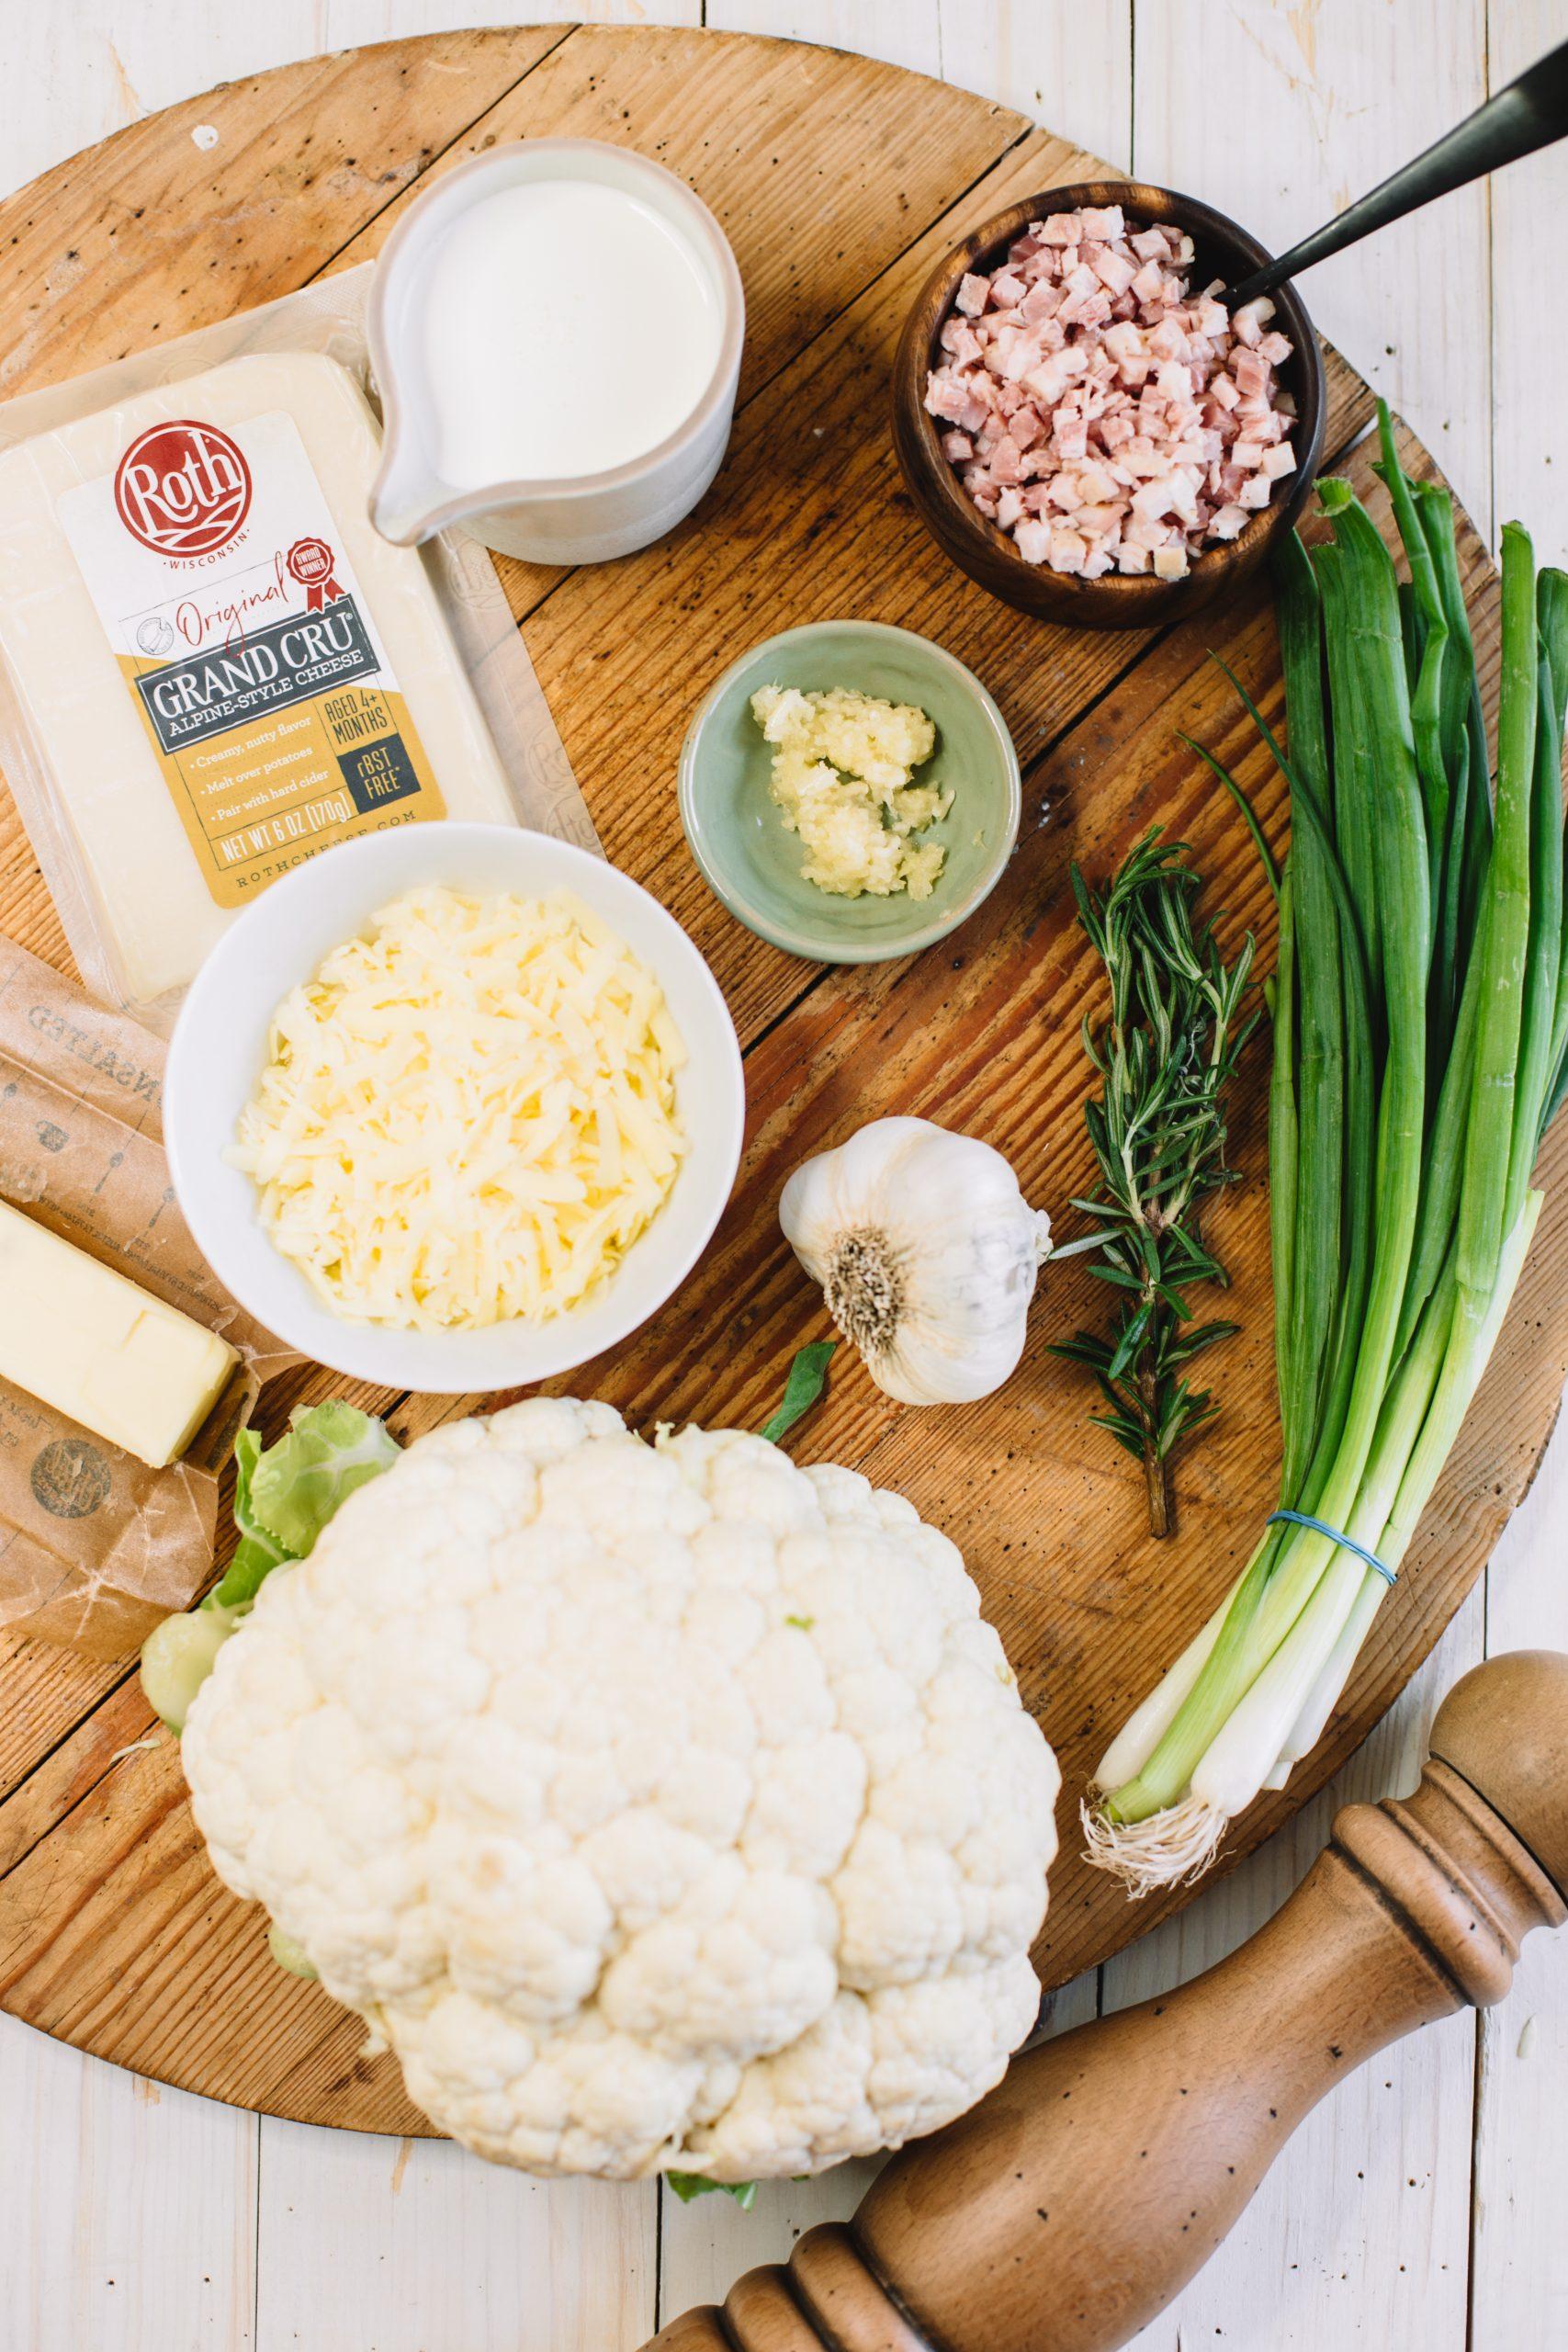 cauliflower, shredded cheese, garlic, rosemary, scallions, pancetta, cream, butter on wooden cutting board